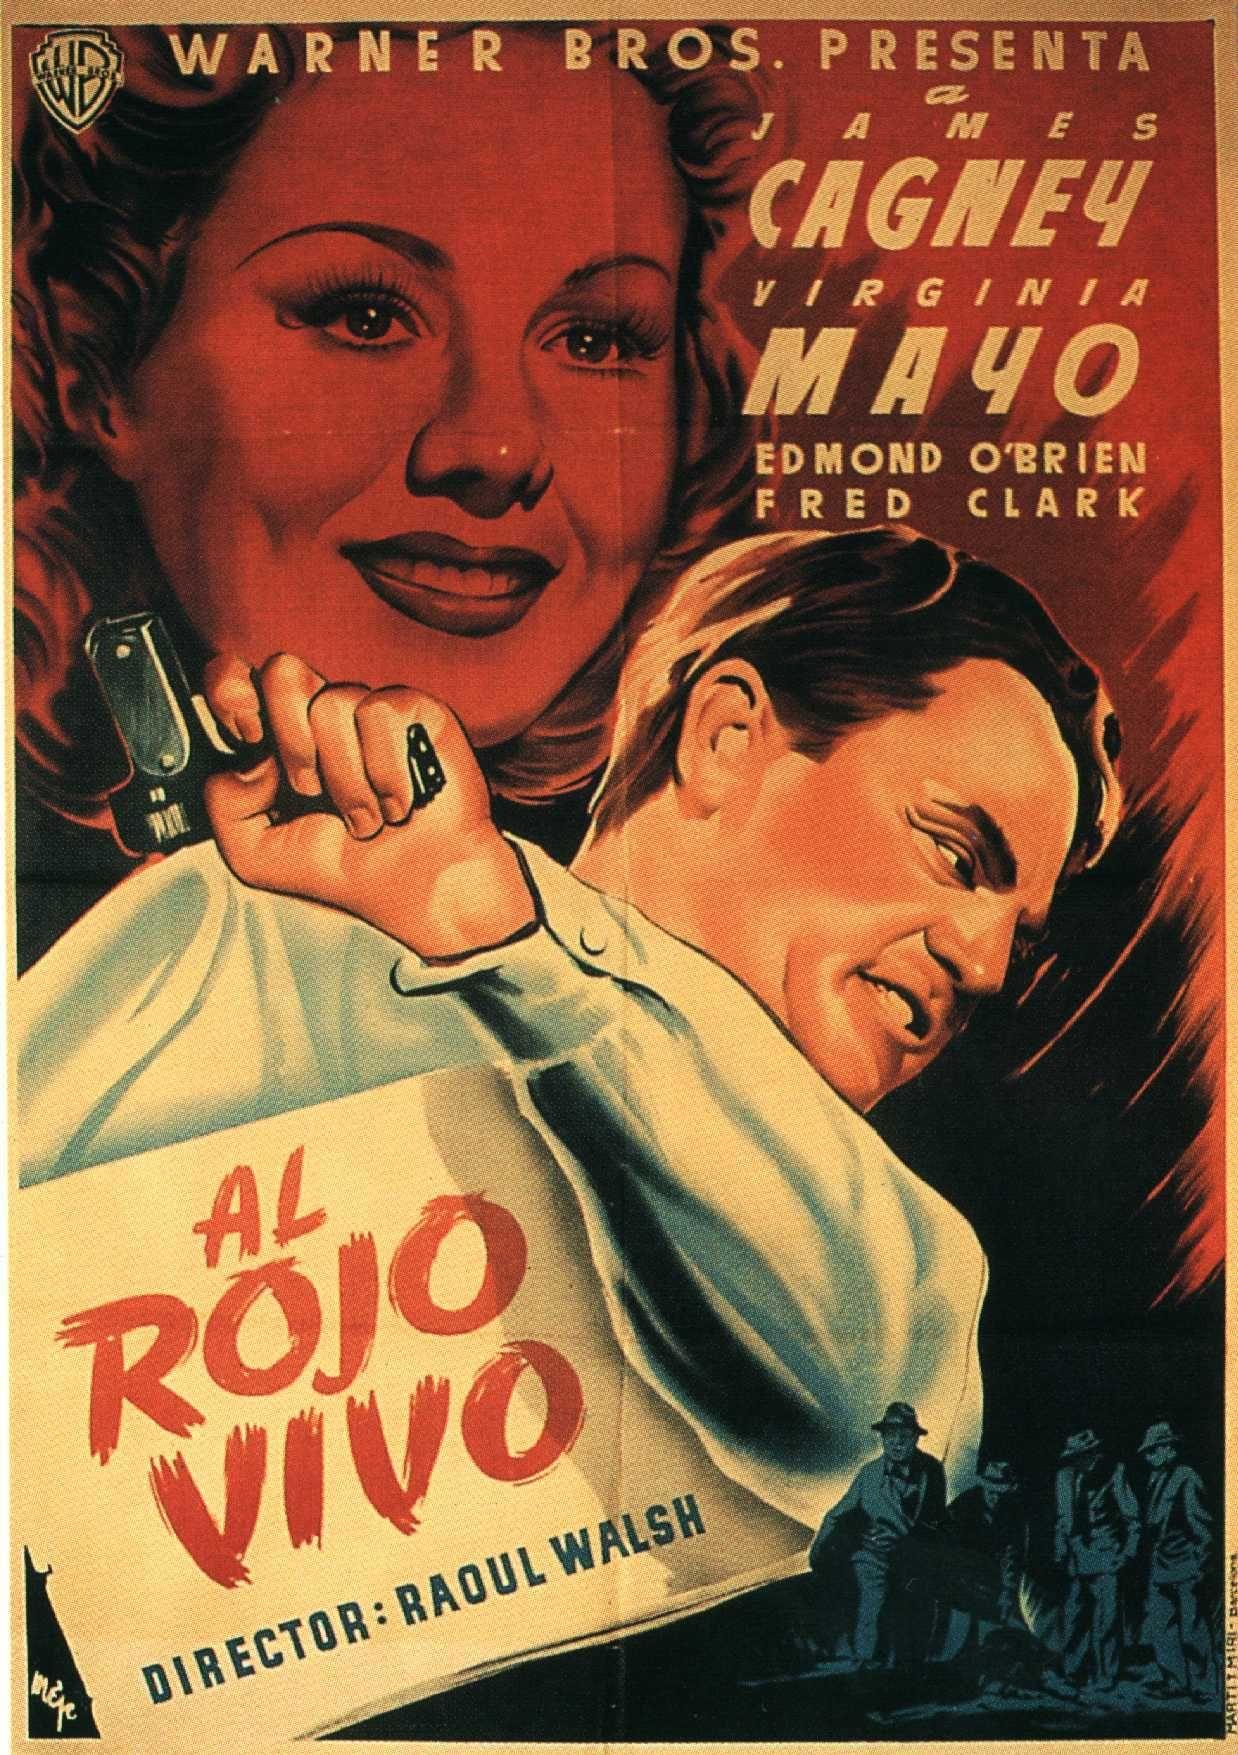 Al Rojo Vivo 1949 Criticas De Cine Carteles De Cine Cine